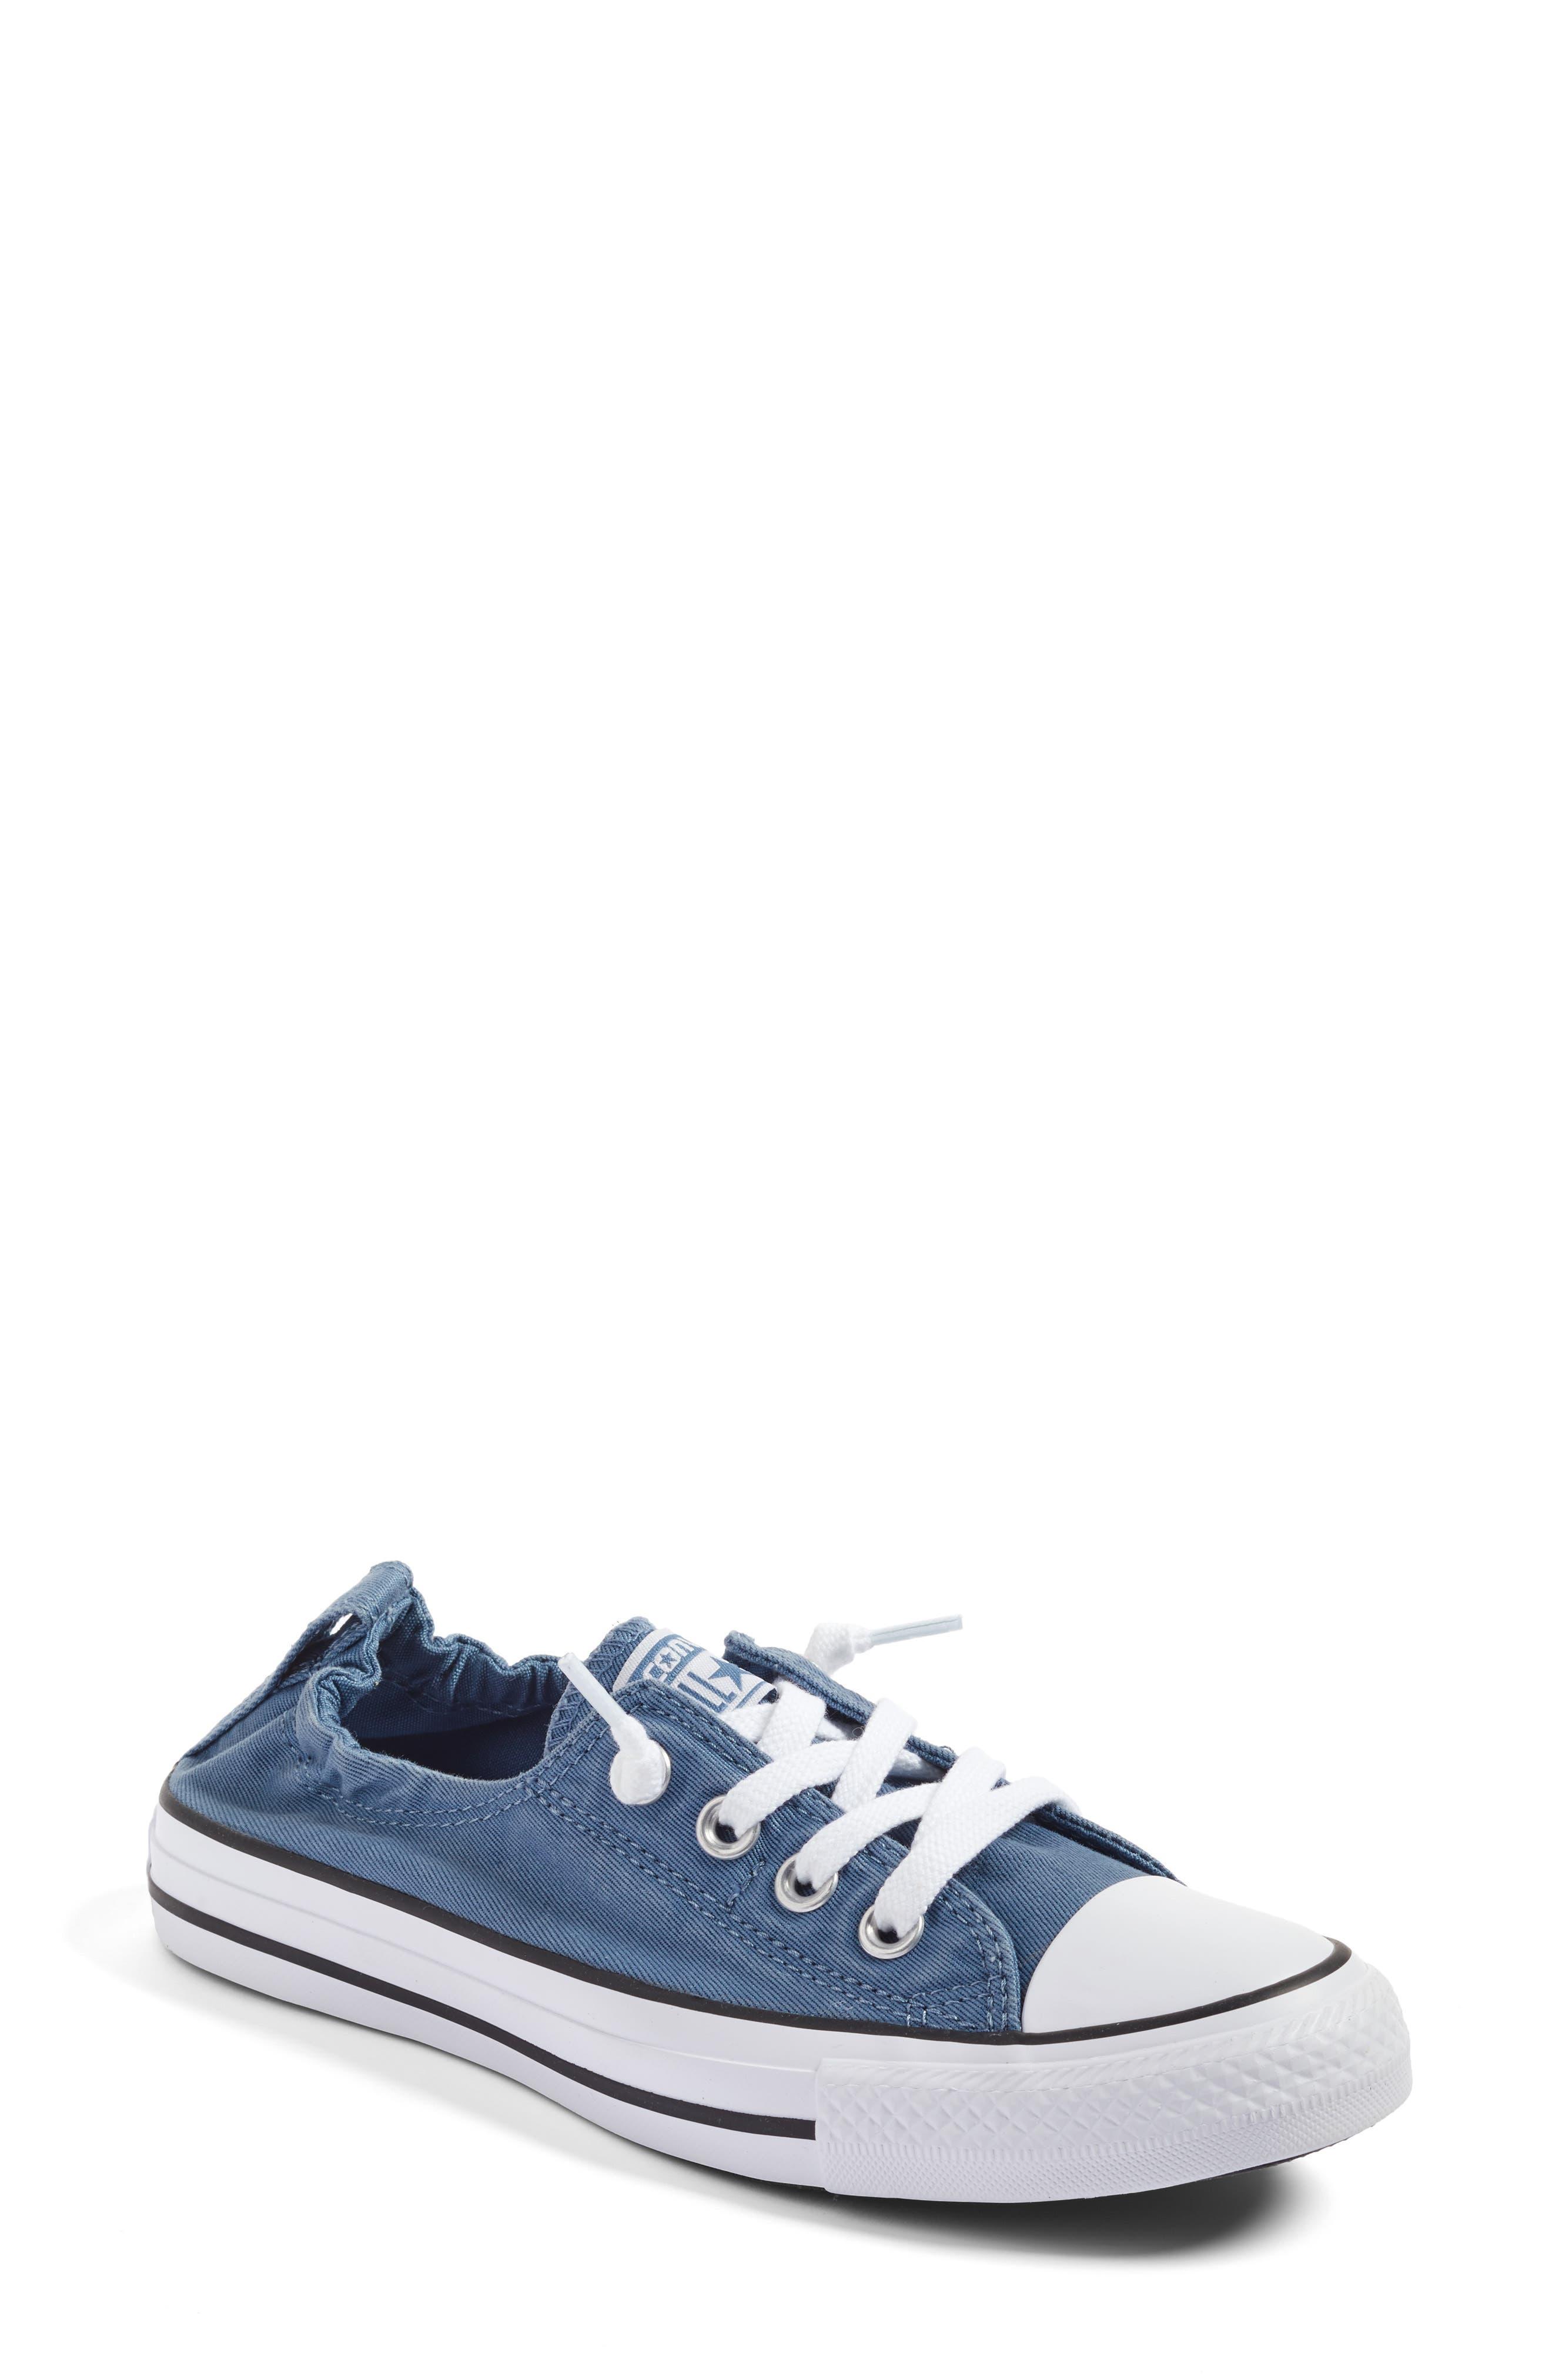 Alternate Image 1 Selected - Converse Chuck Taylor® 'Shoreline' Sneaker (Women)